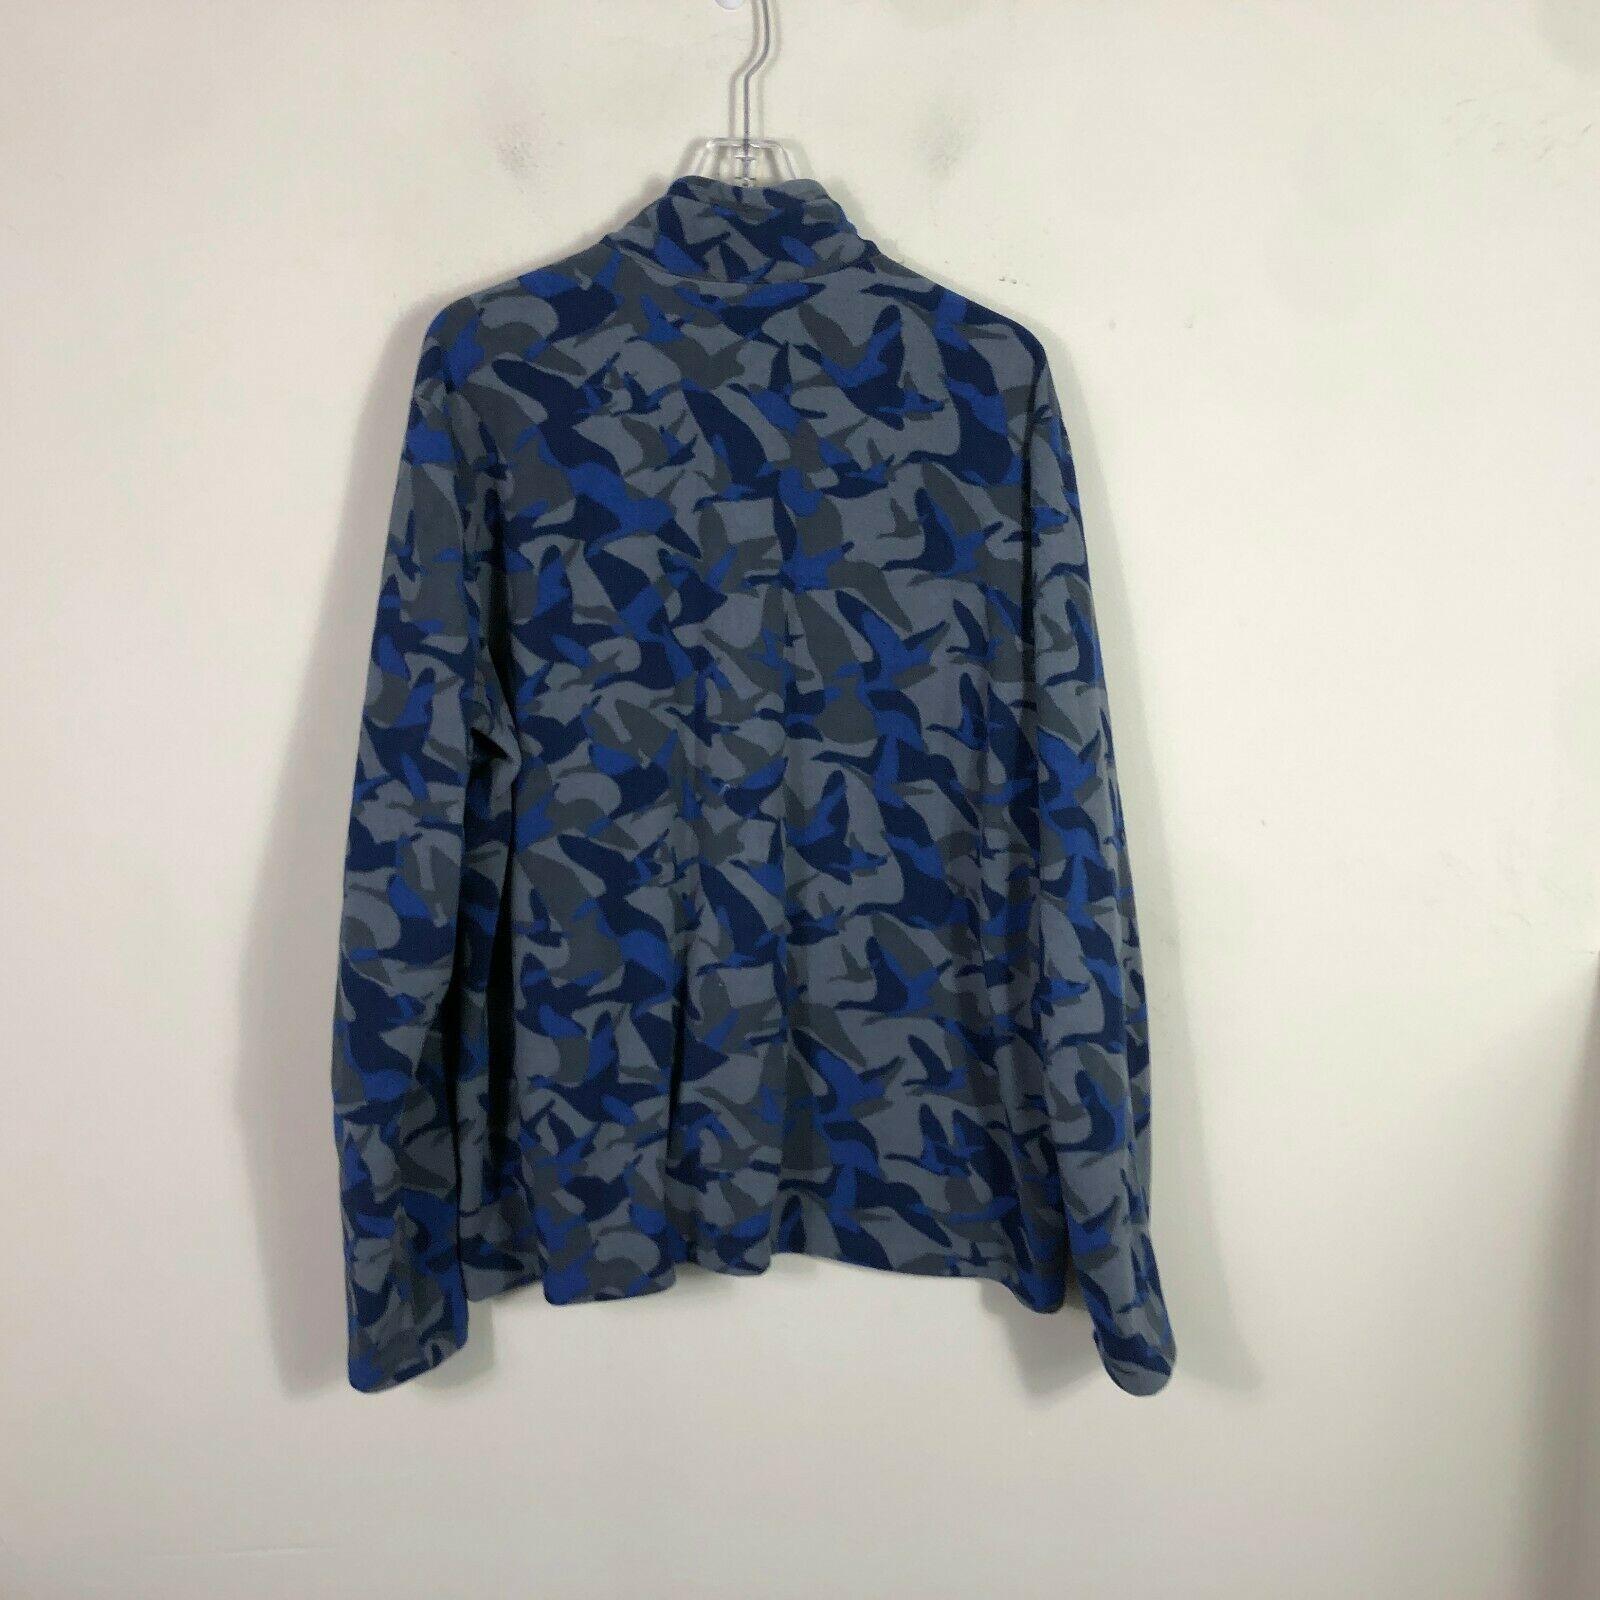 Eddie Bauer First Ascent Fleece Jacket 1/2 Zip Men's 2XL Blue Gray Long Sleeve image 5